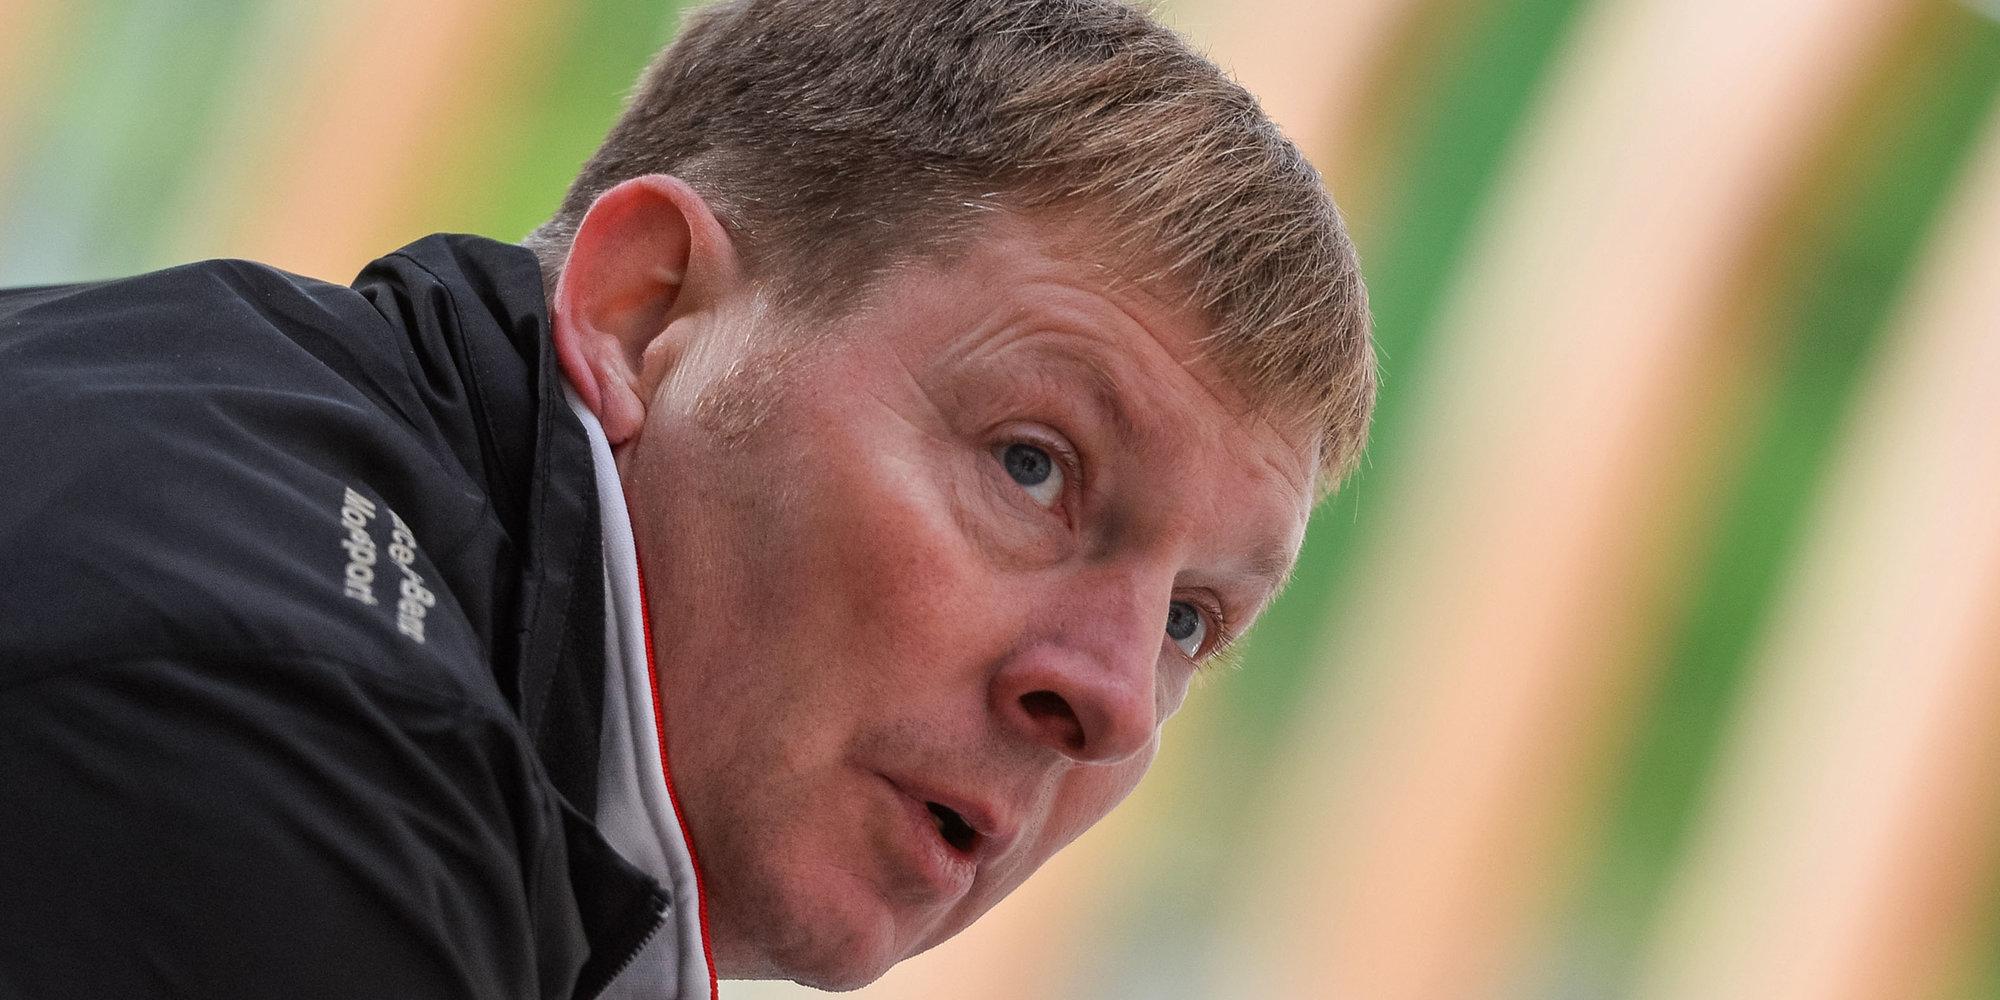 Зубков объявил о«чистоте» русских спортсменов наОлимпиаде вСочи